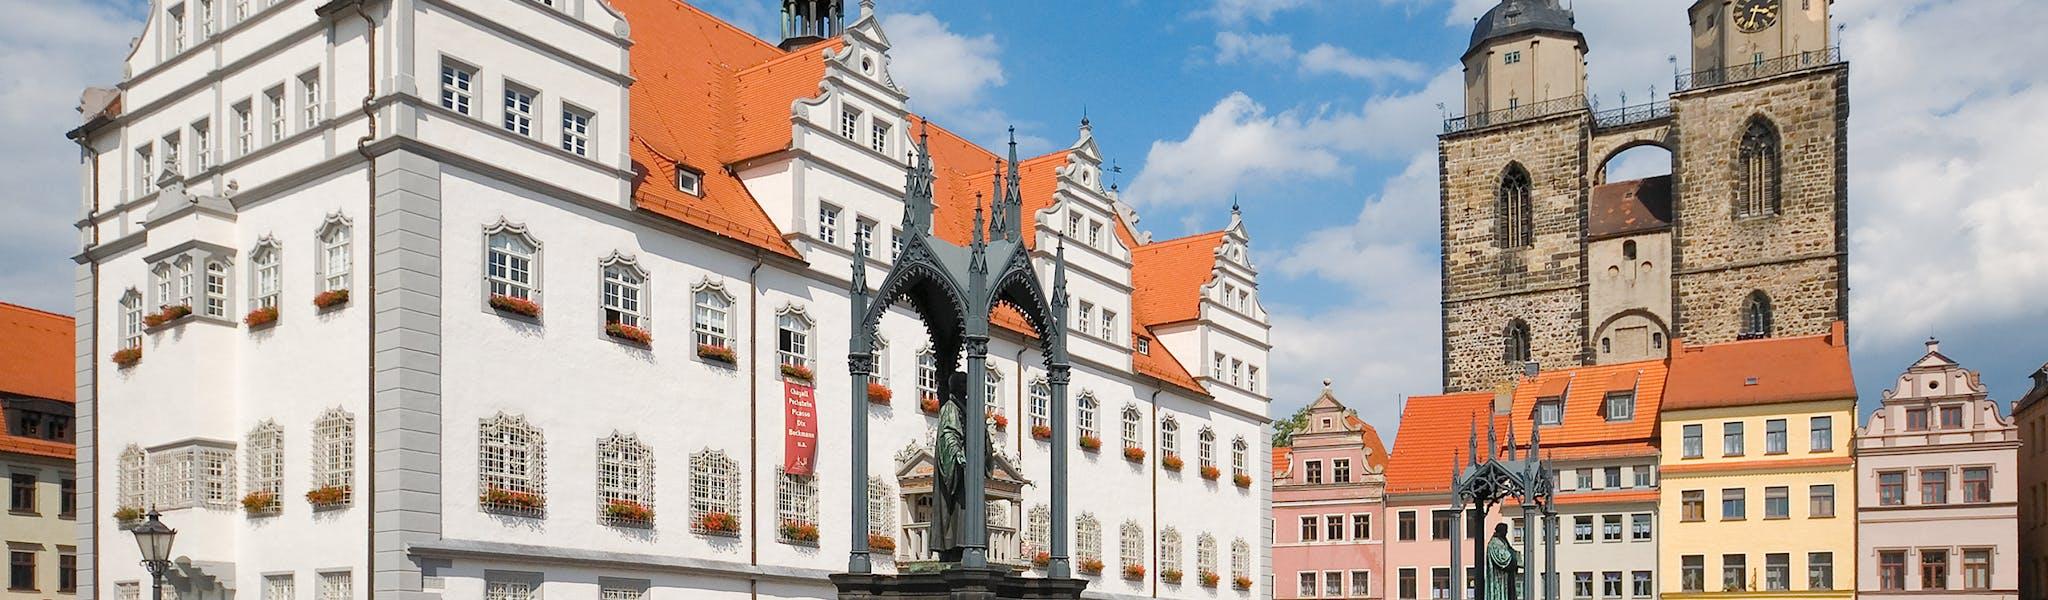 Wittenberg-centrum Elbe